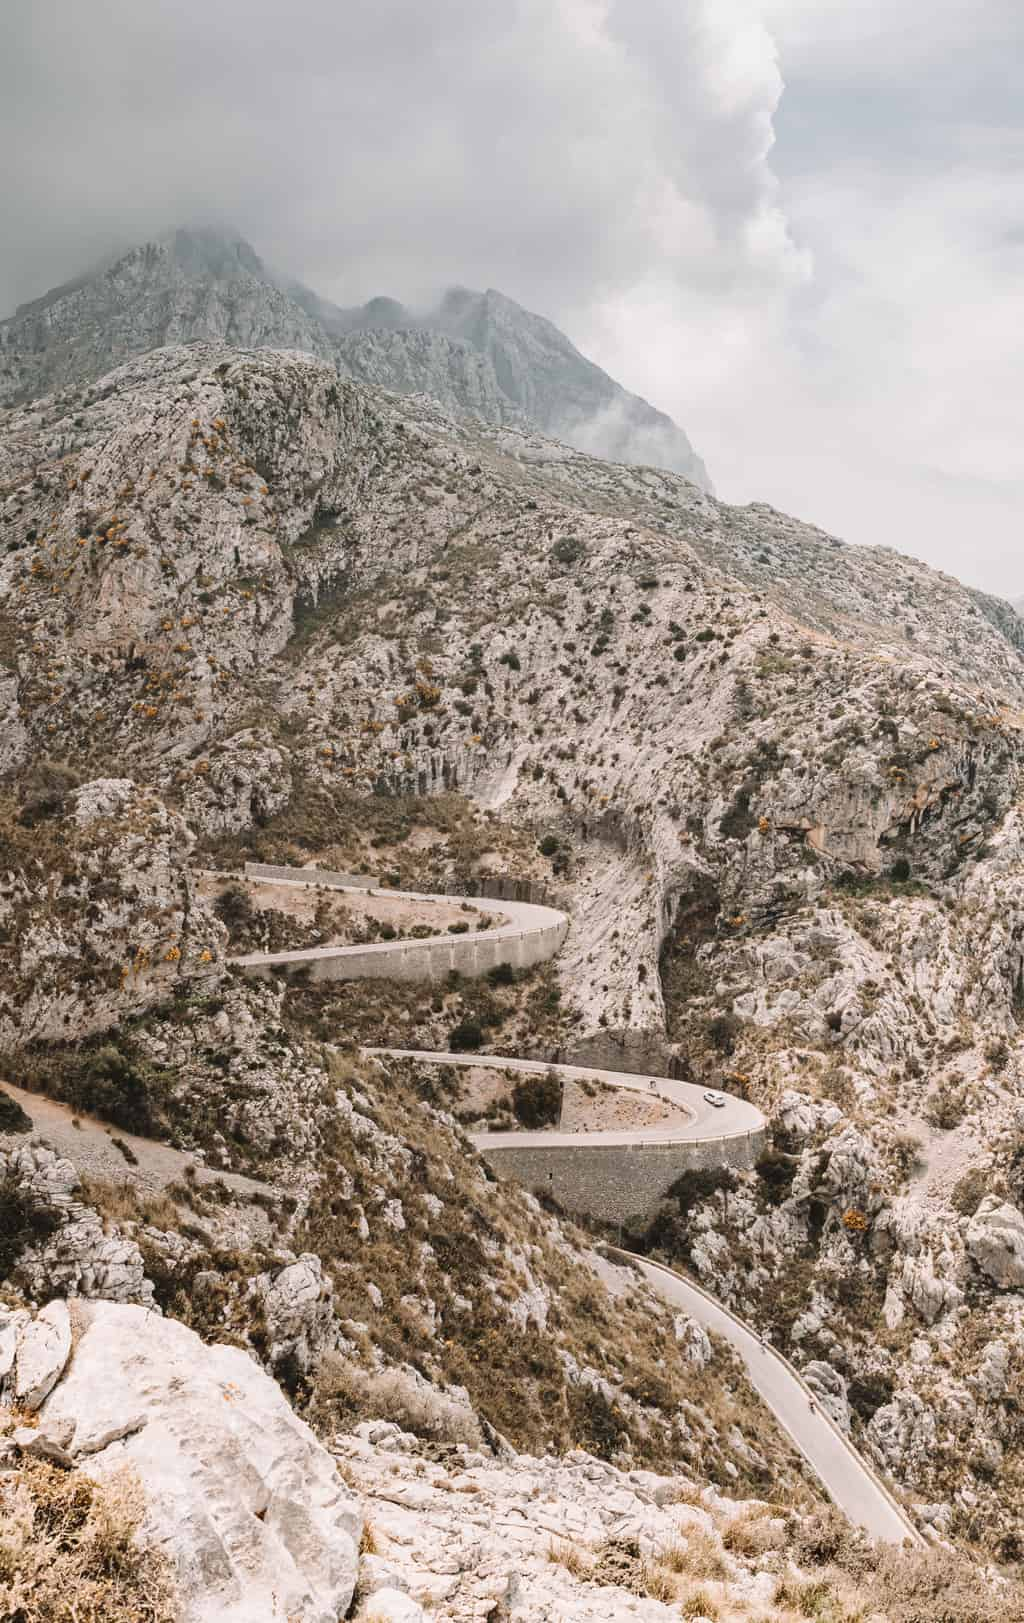 Road to sa calobra beach in Mallorca